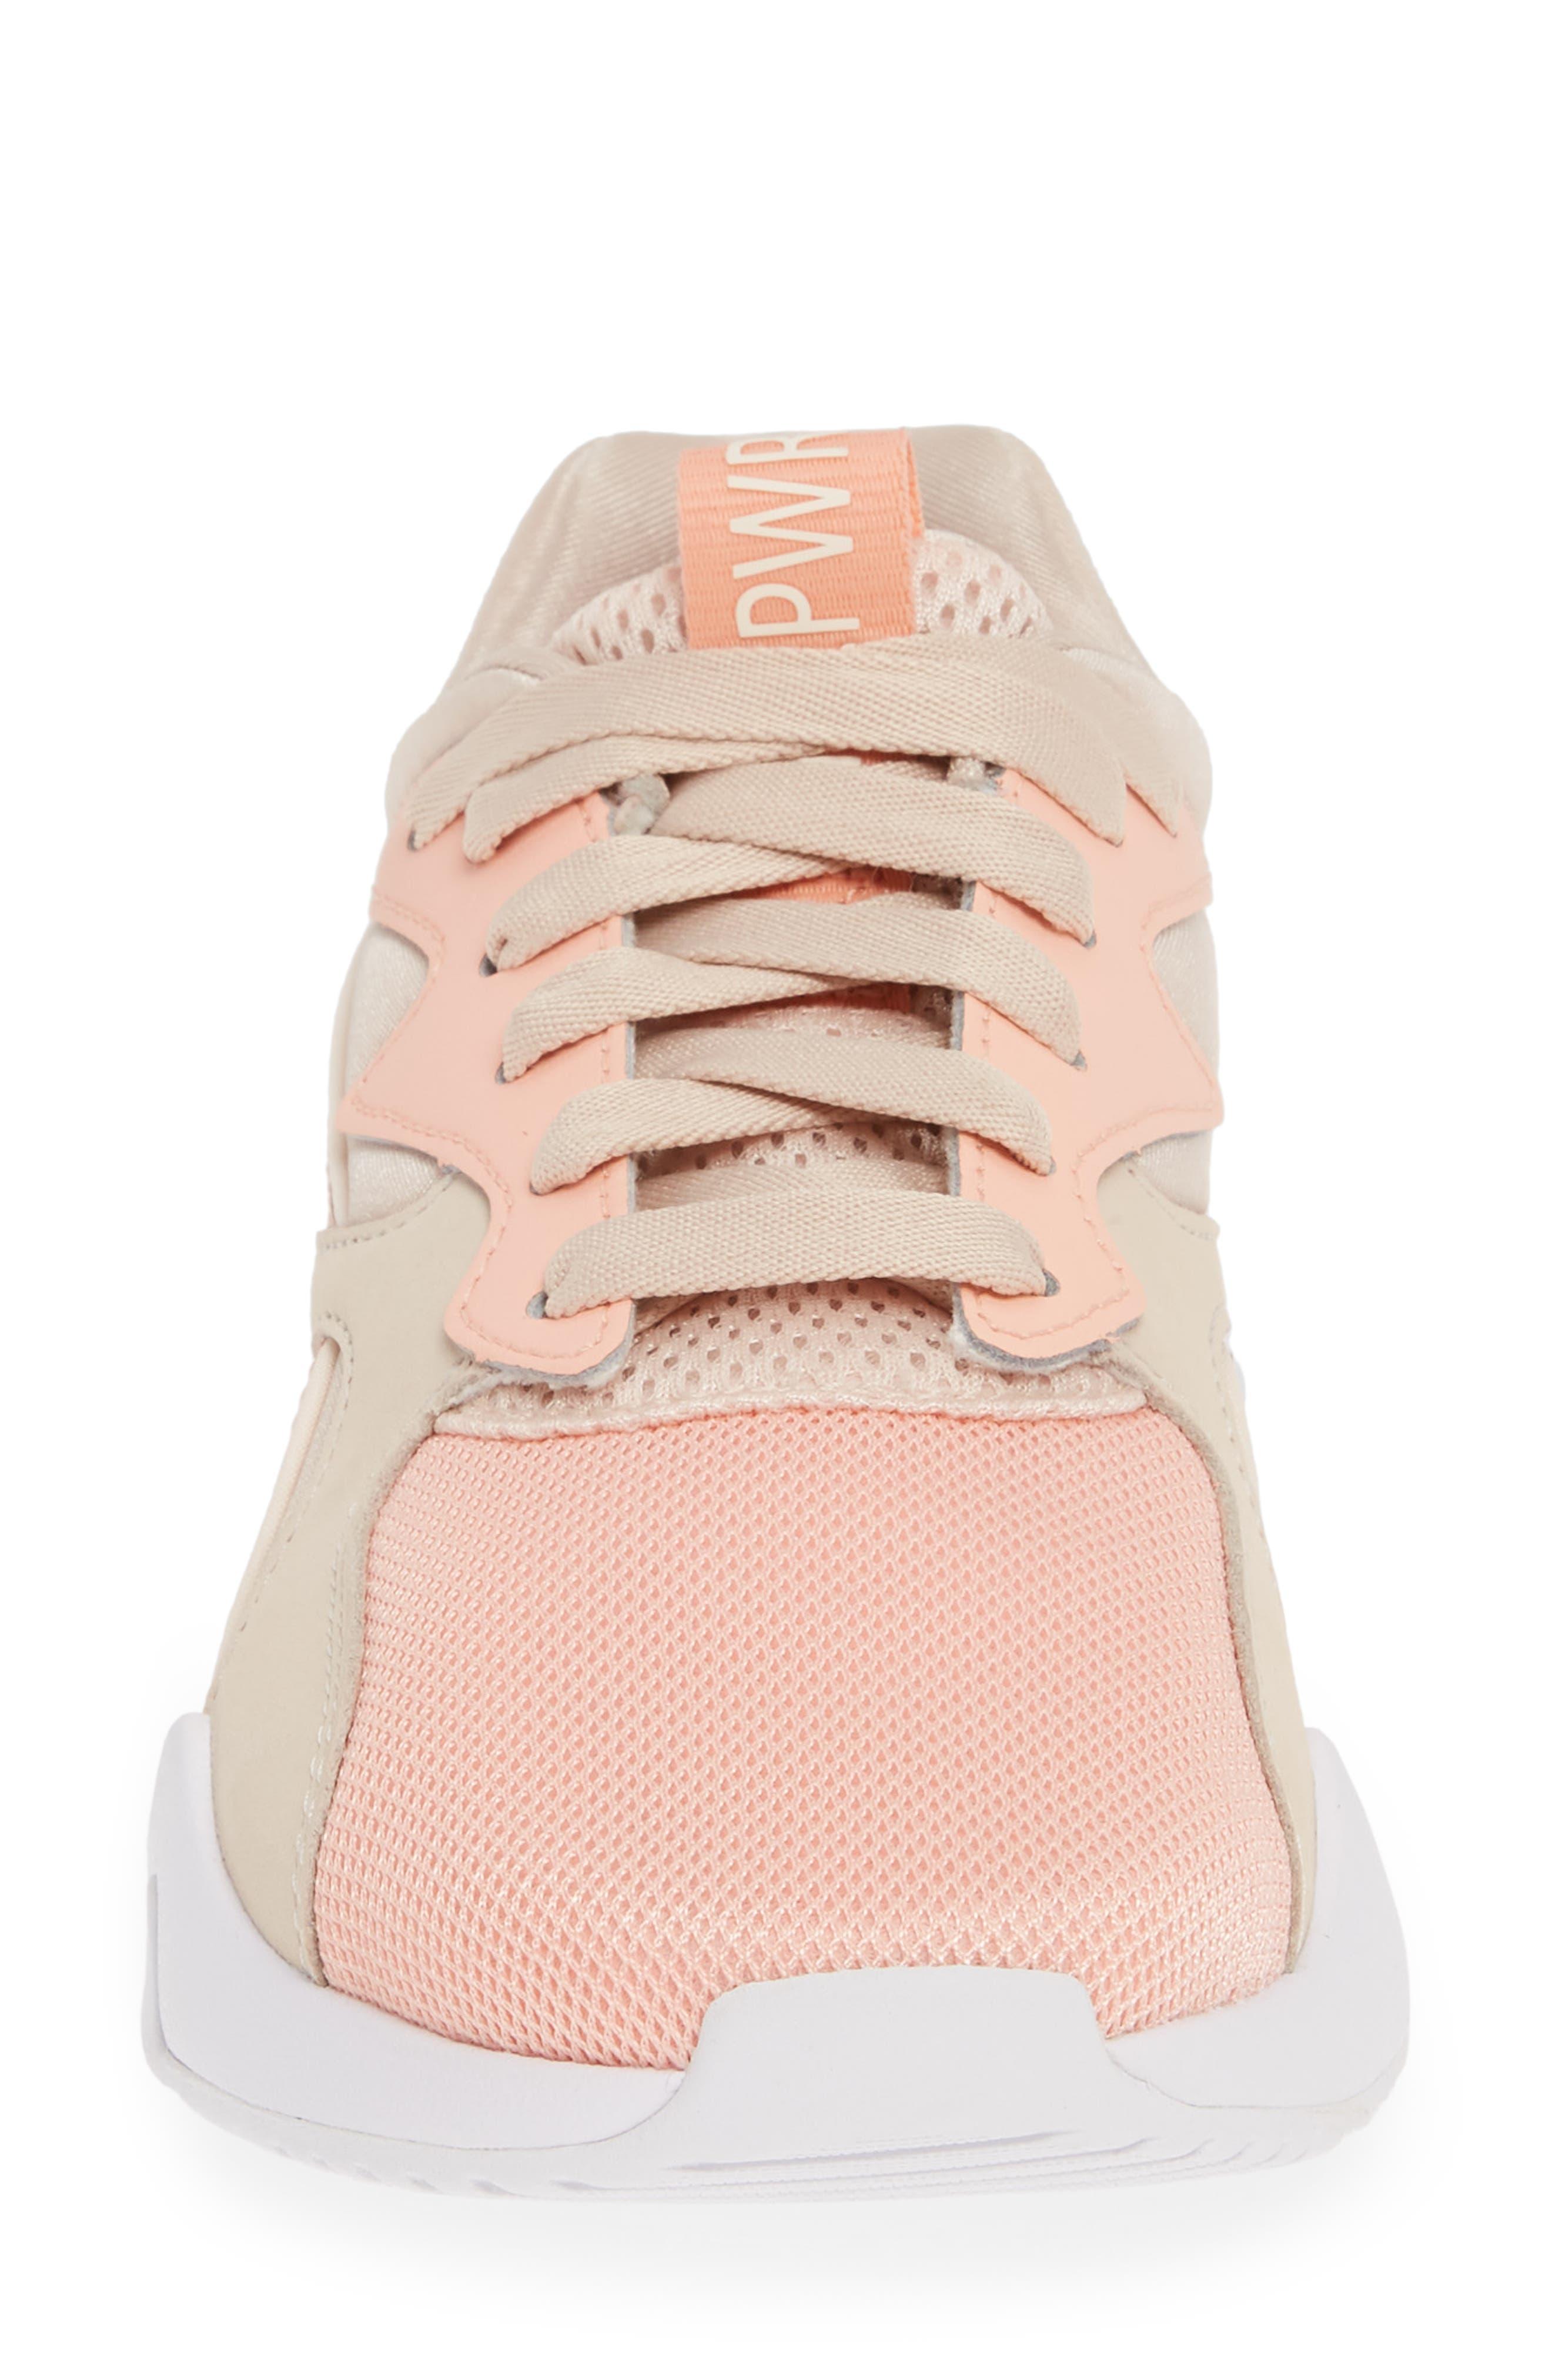 PUMA, Nova GRL PWR Sneaker, Alternate thumbnail 4, color, PEACH BUD/ PEARL BLUSH